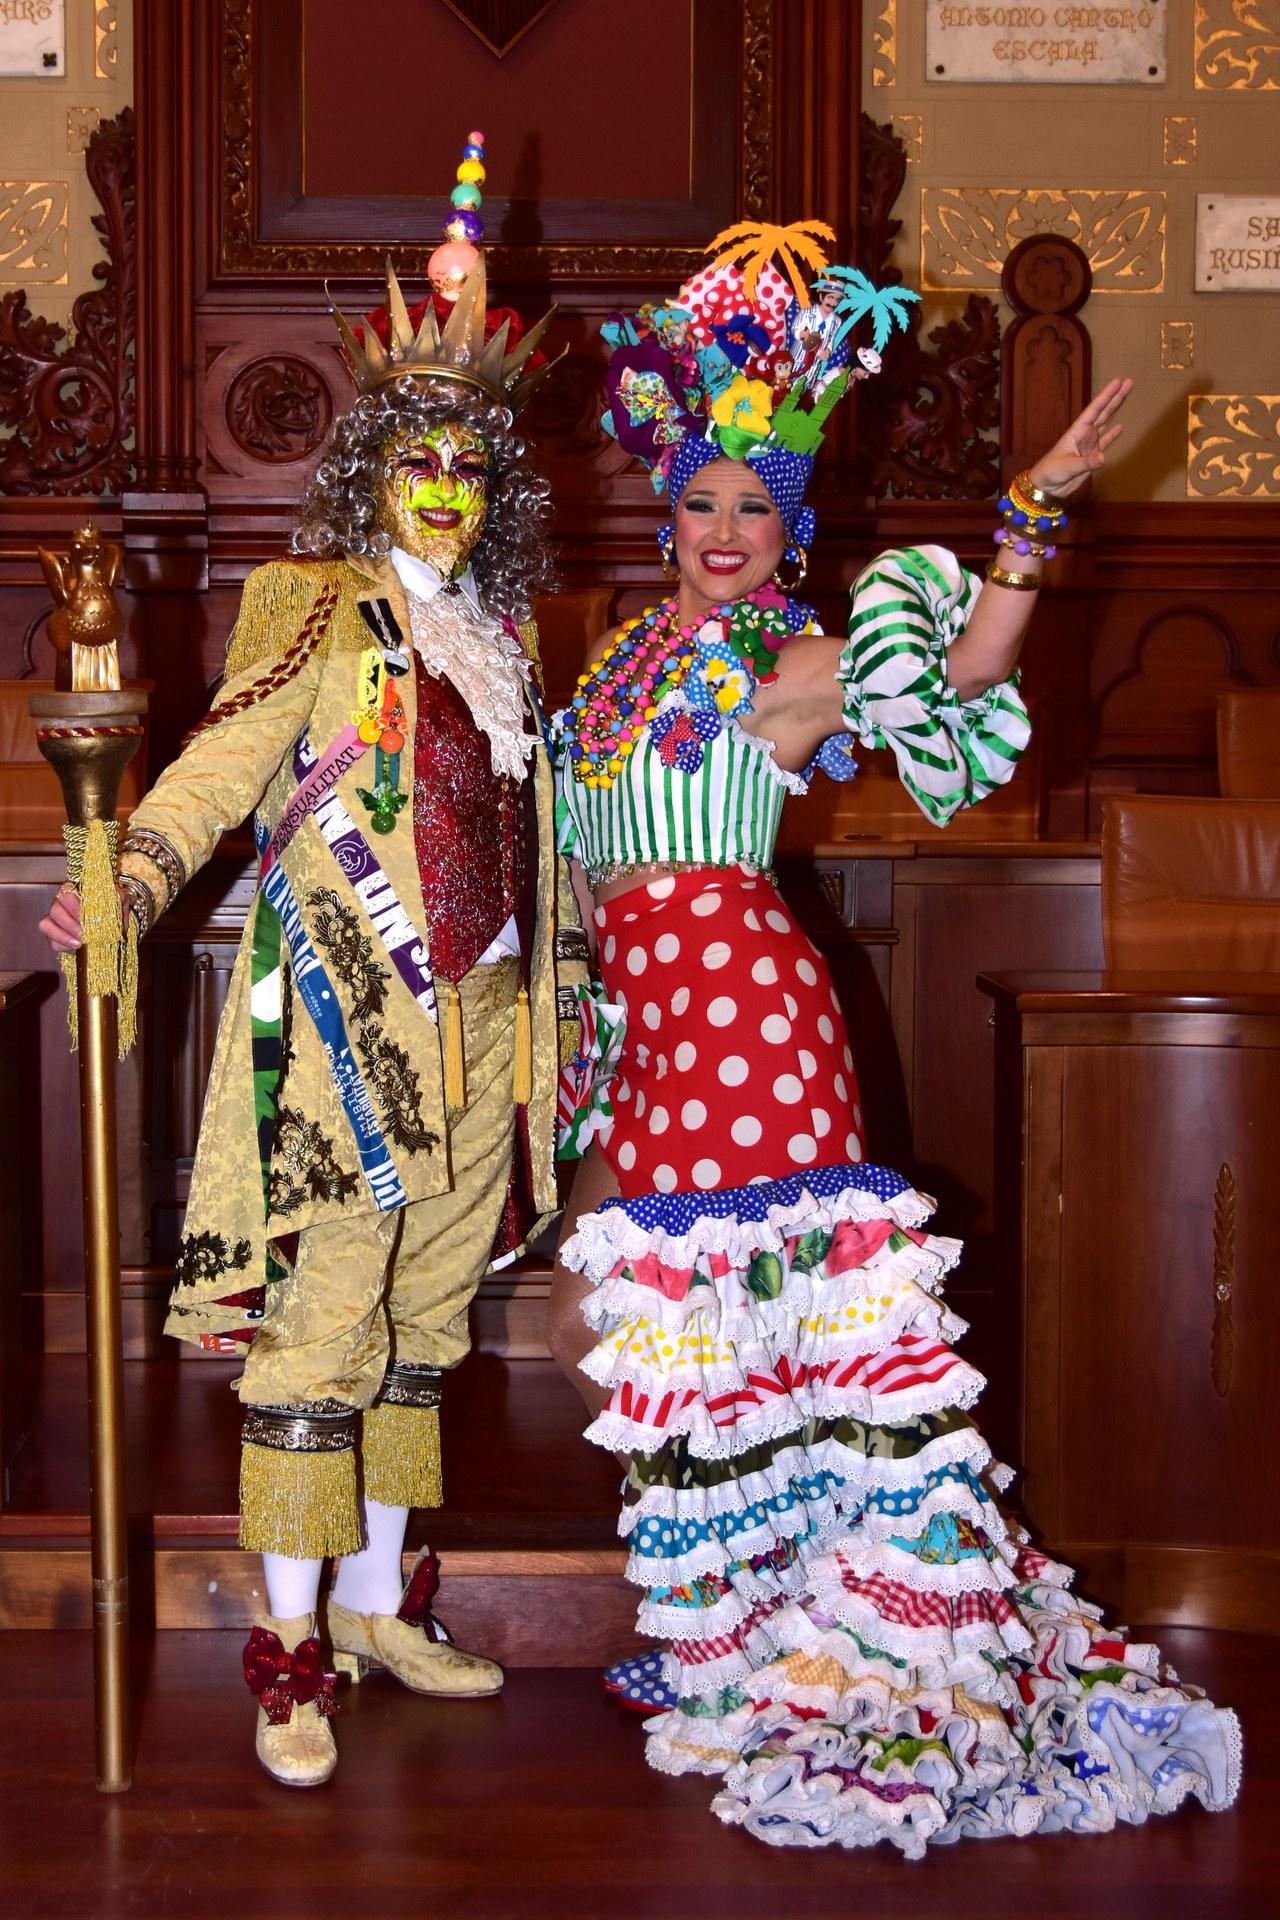 Sa Majestat Carnestoltes i la Reina del Carnaval 2019